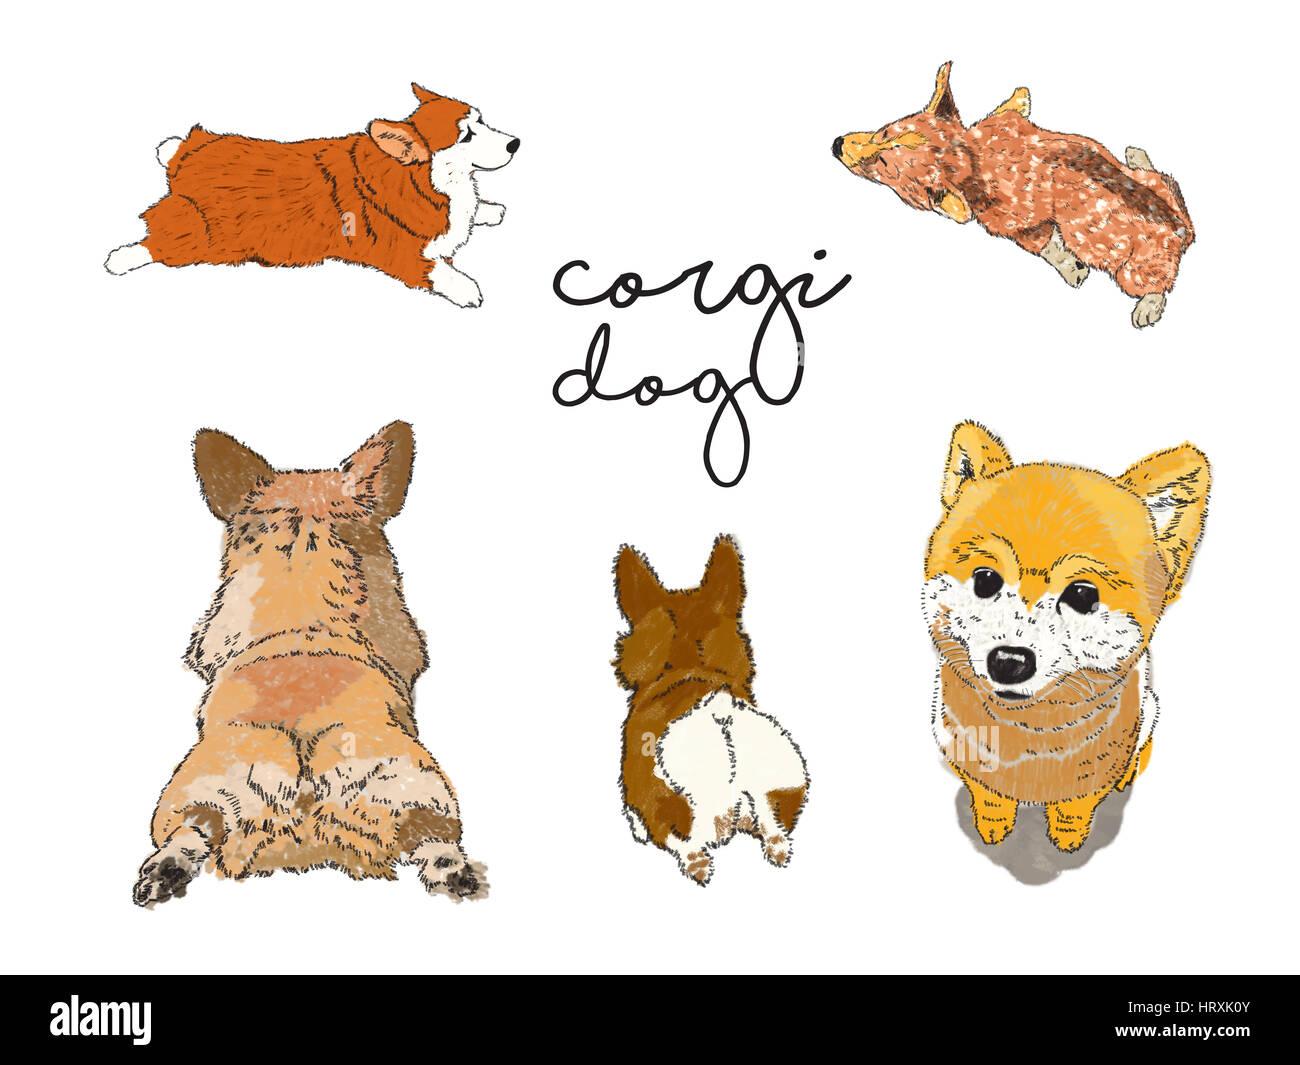 Corgi und Shiba hund Abbildung crated durch ohne Bezug. Stockbild